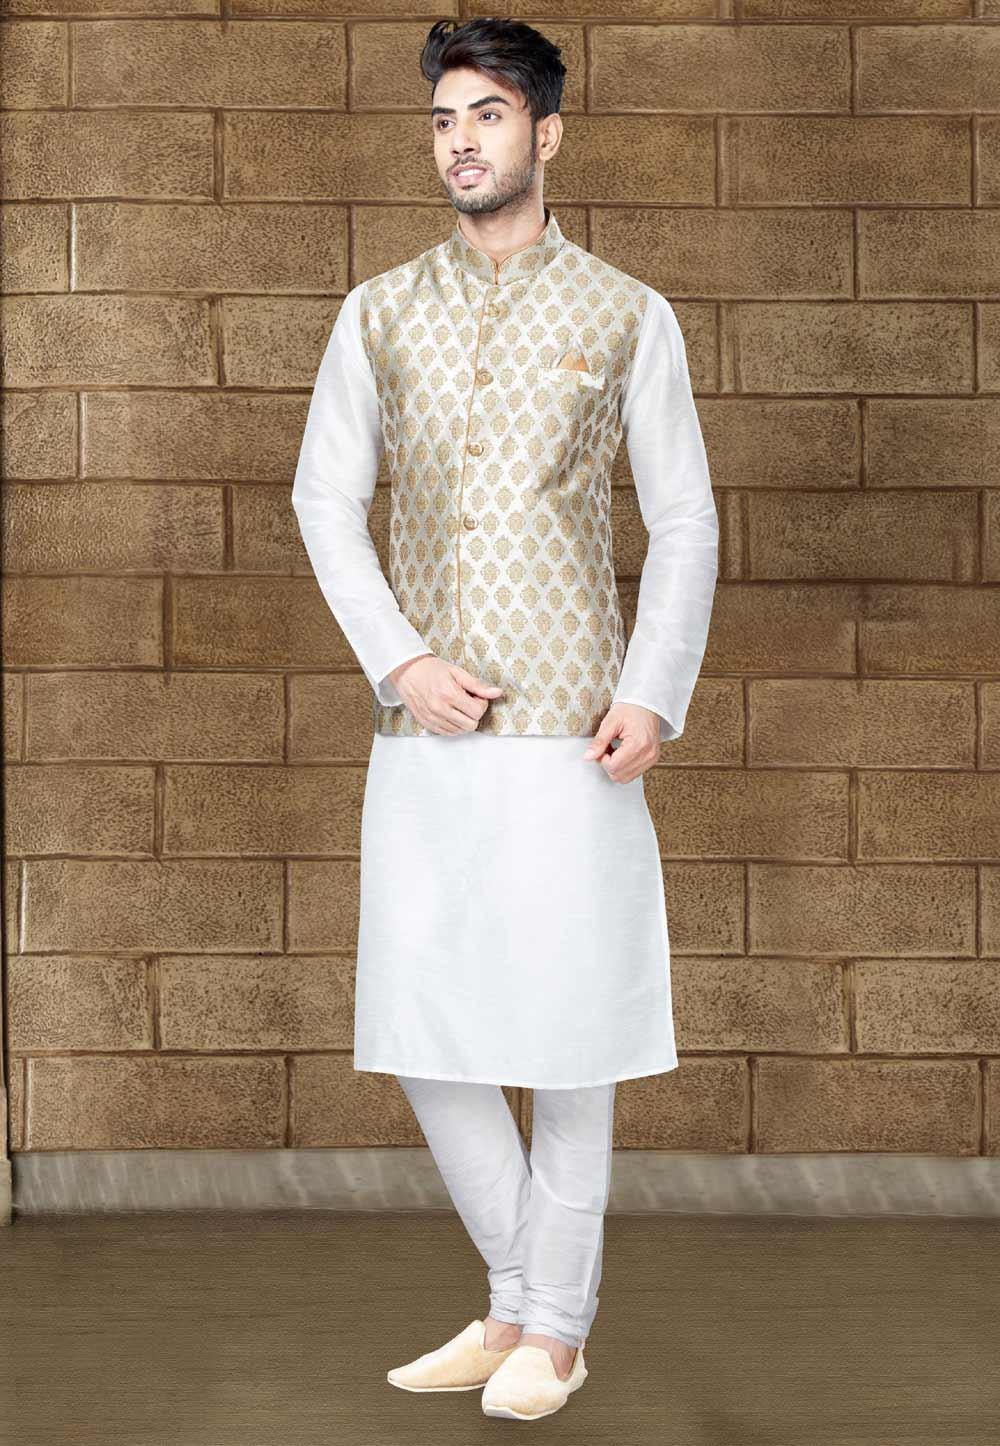 adbbfbc1e0f Off White Color Readymade Kurta Pajama With Jacket